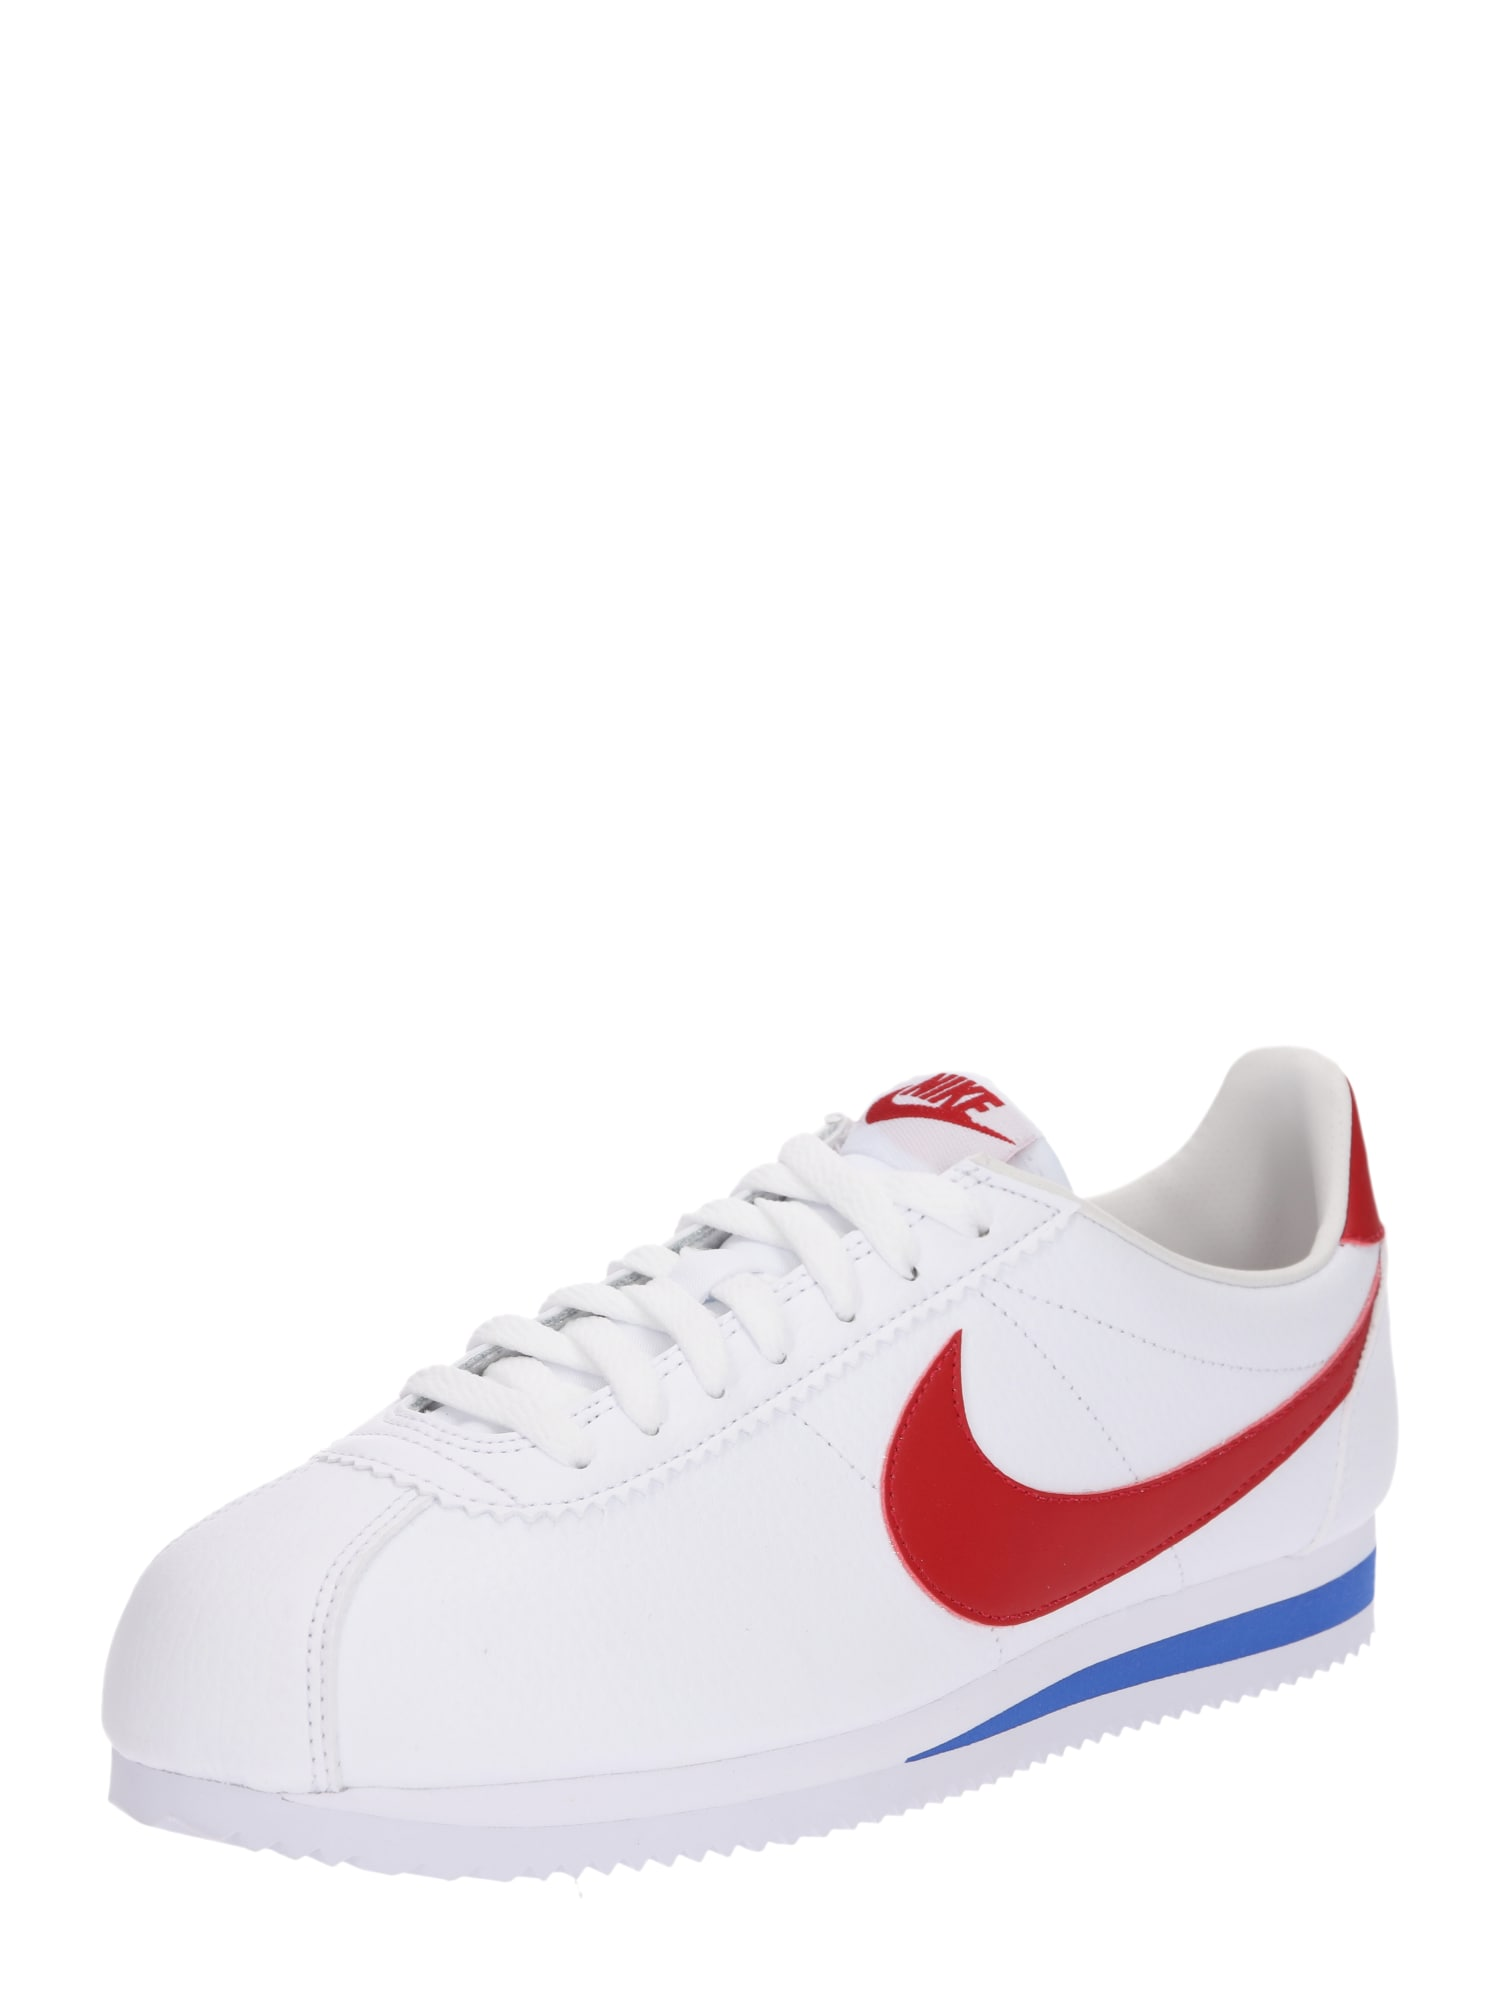 Nike Sportswear, Heren Sneakers laag 'Classic Cortez Leather', rood / wit